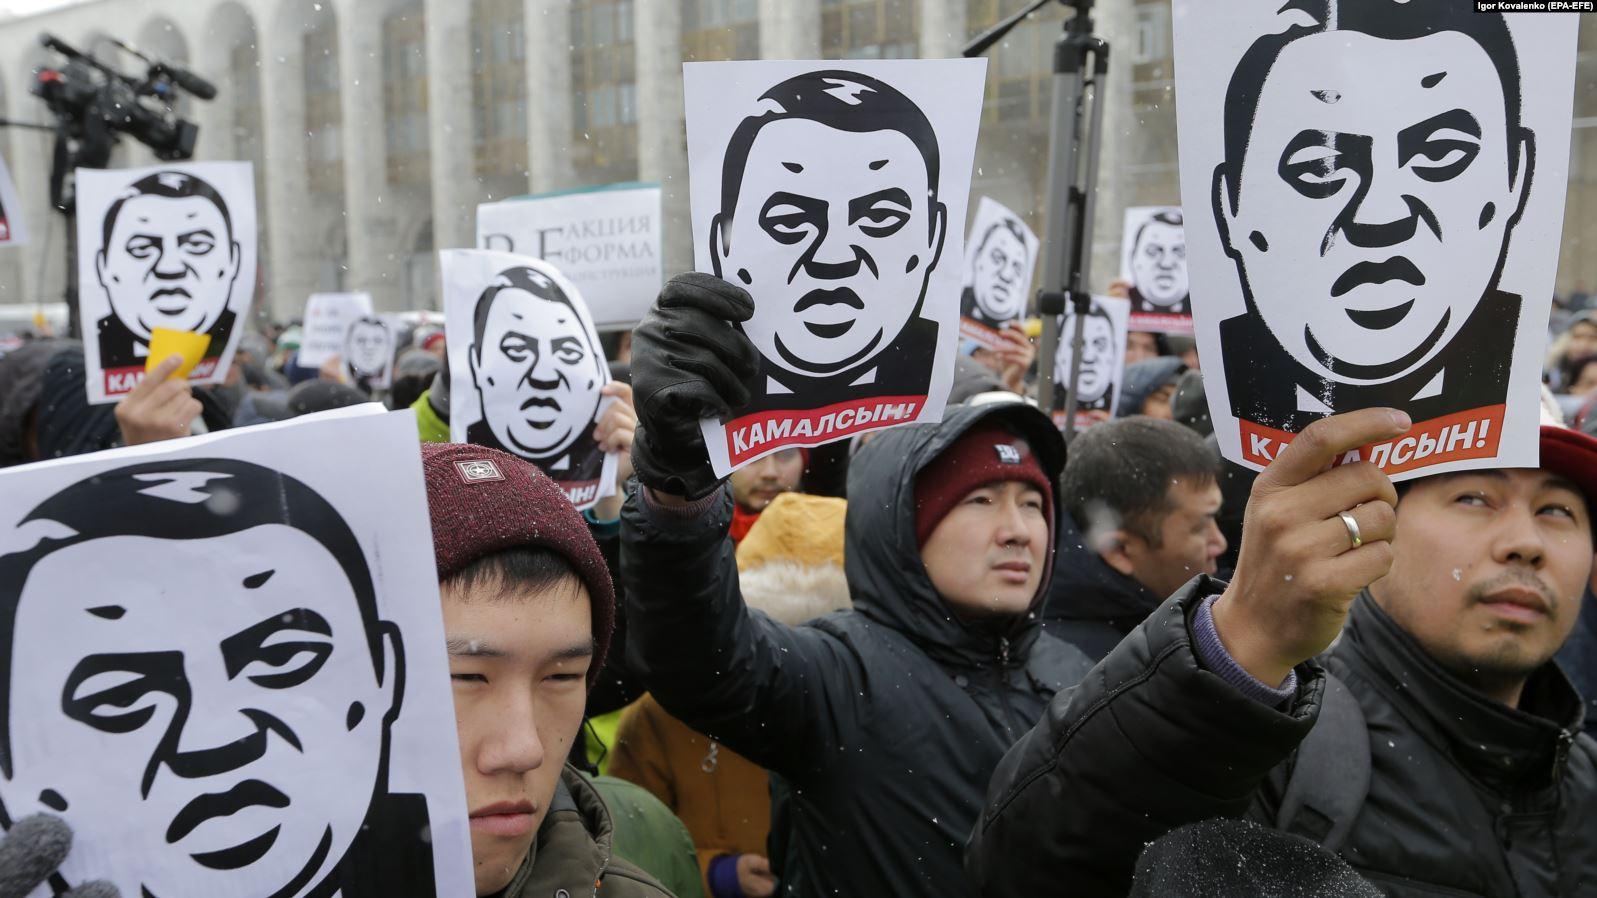 RFE/RL Kyrgyz Service investigative reporter receives death threat